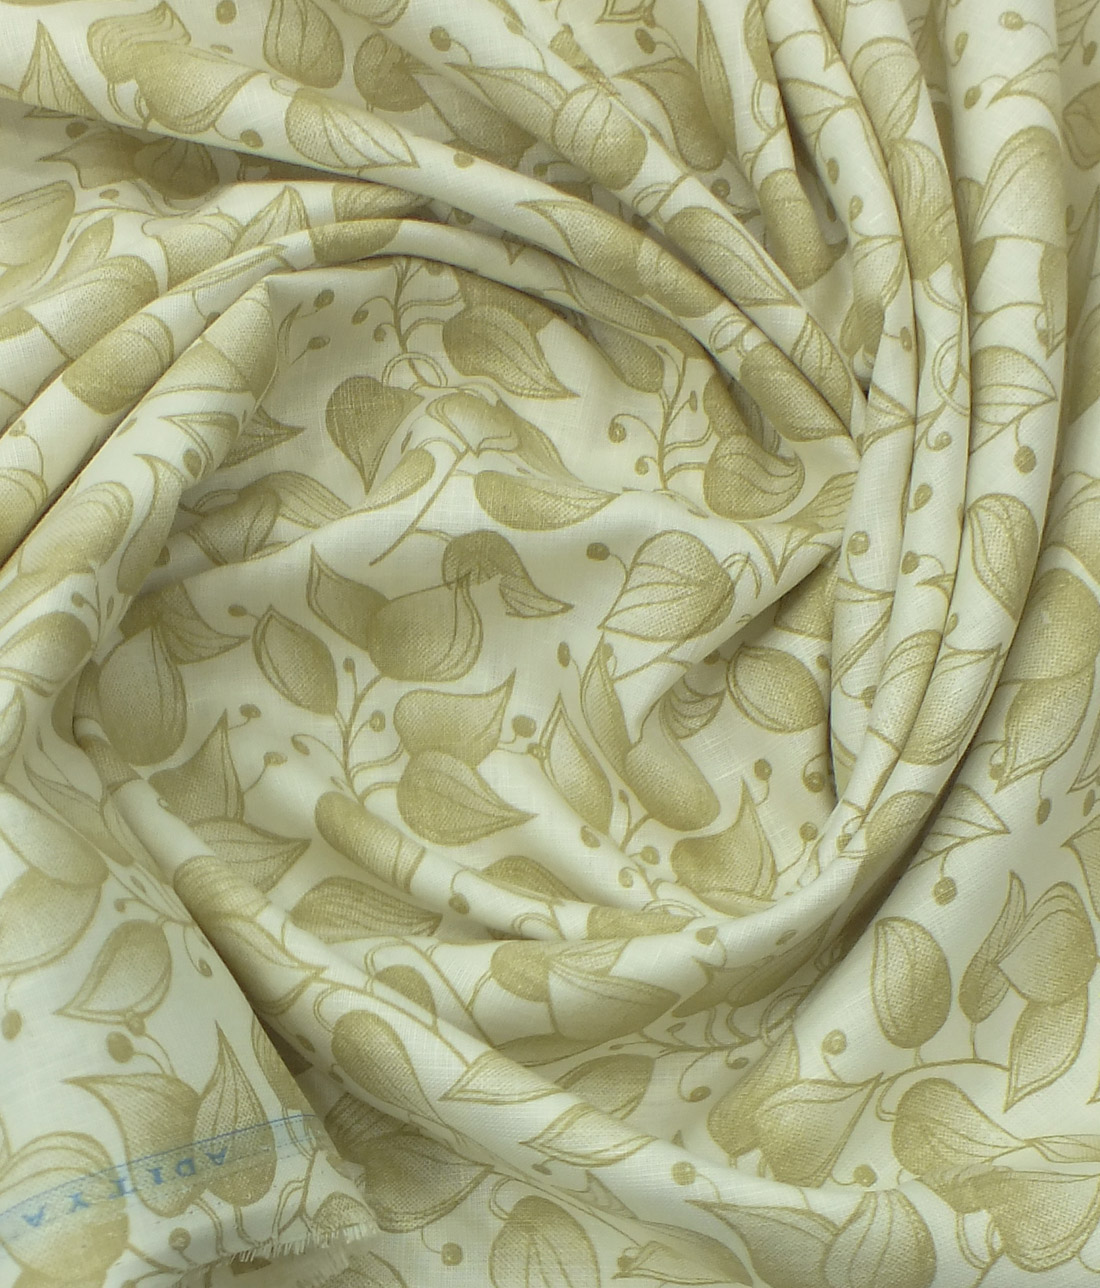 Beige And Coffee Plaid Print Linen Contemporary Bedroom: Linen Club Cream 65% Linen 35% Cotton Beige Floral Print